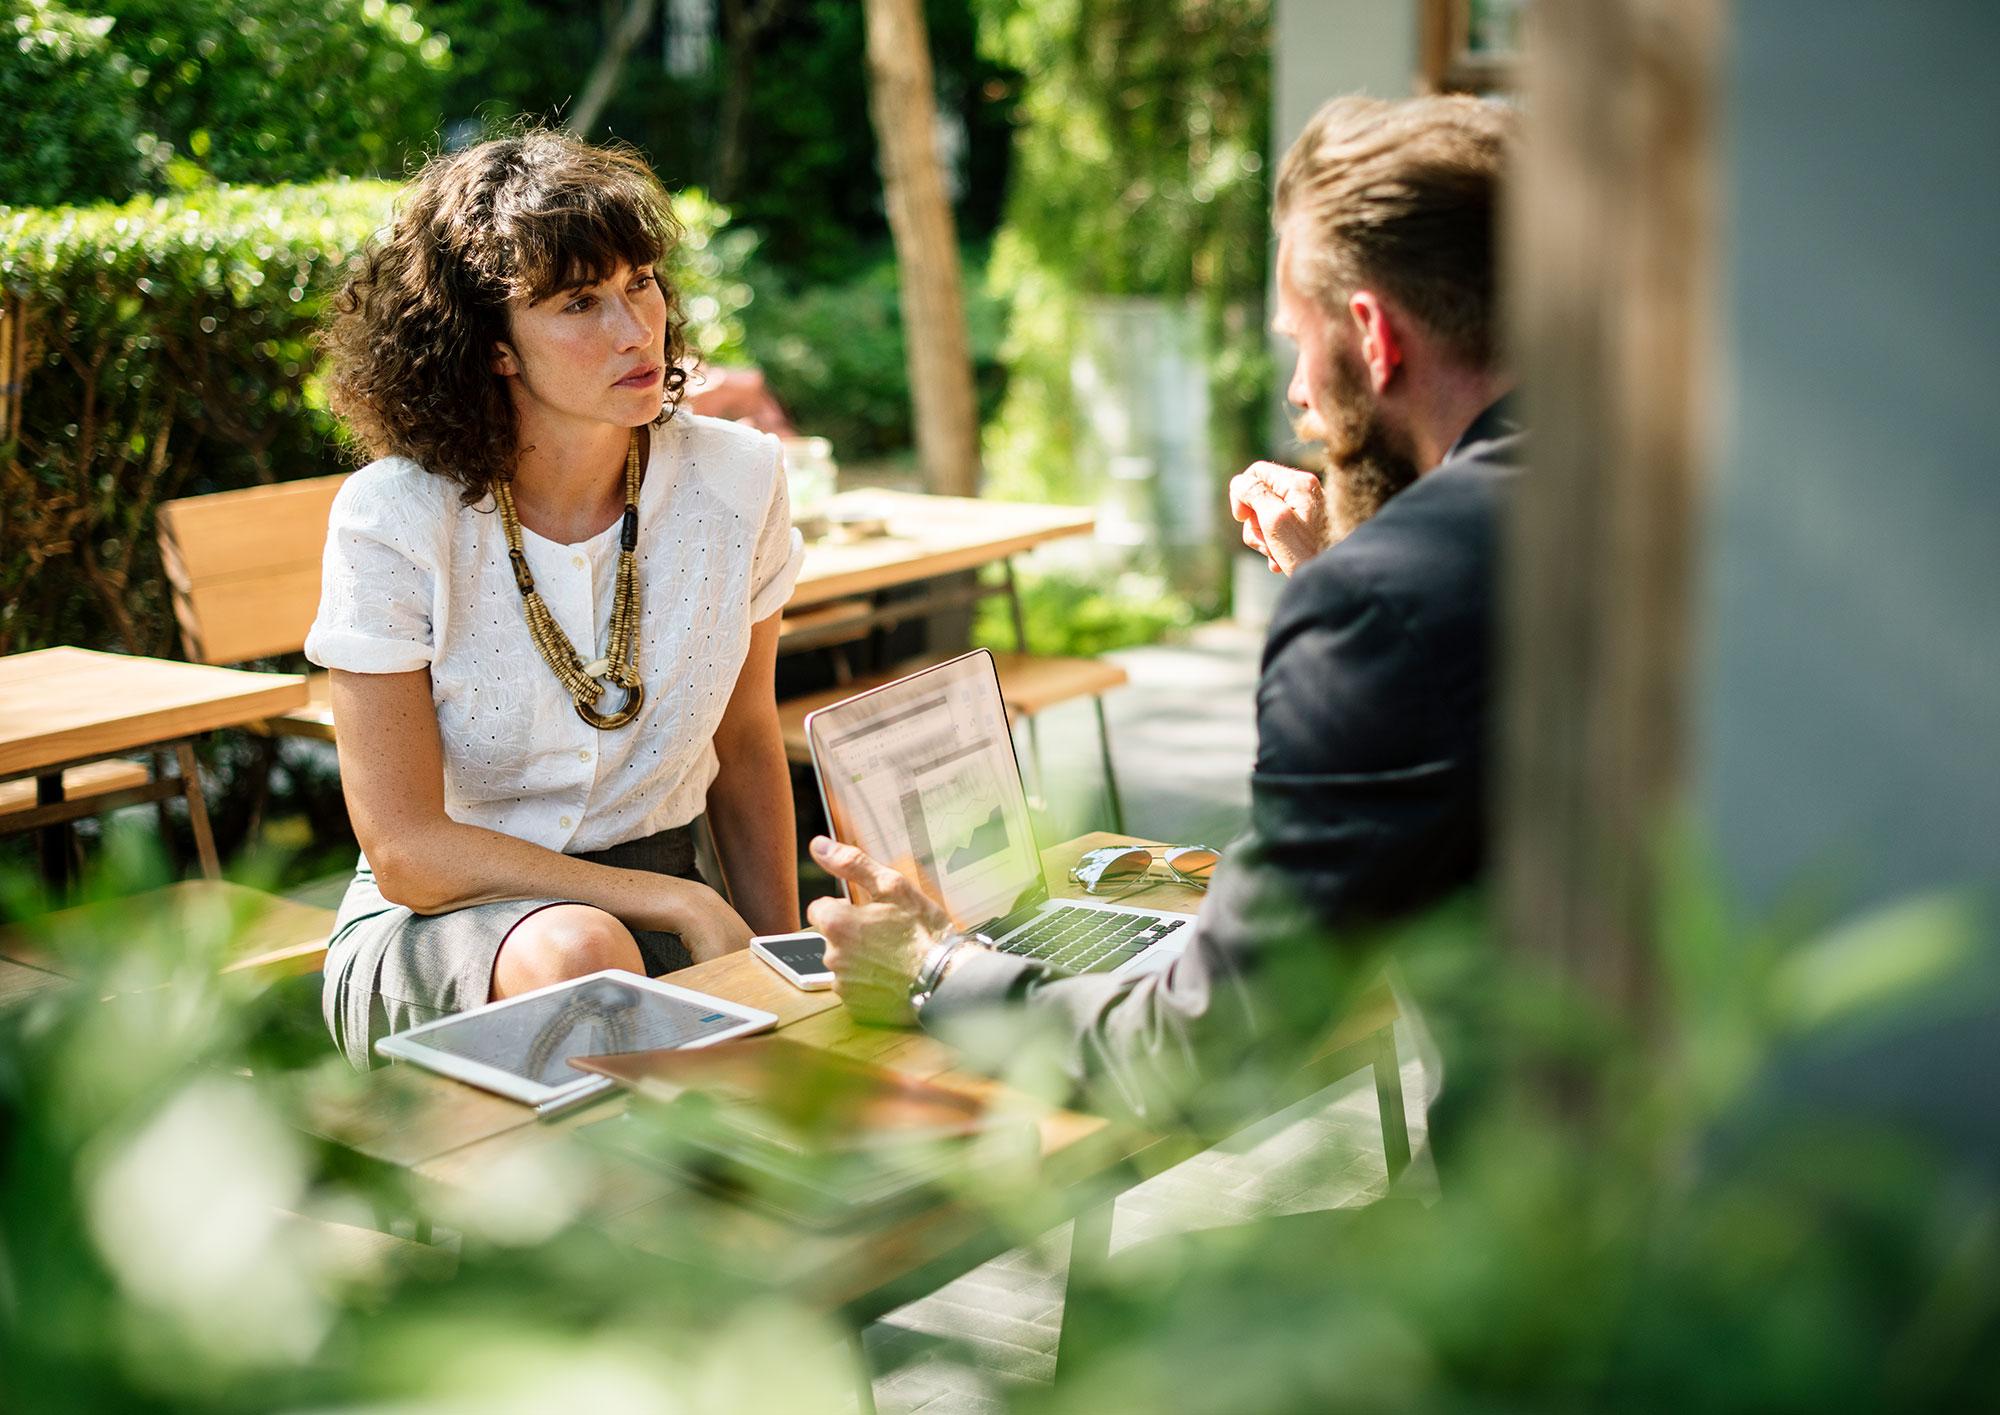 Les-Naly-Career-Advice-Women-Travel-Business-Trip.jpg